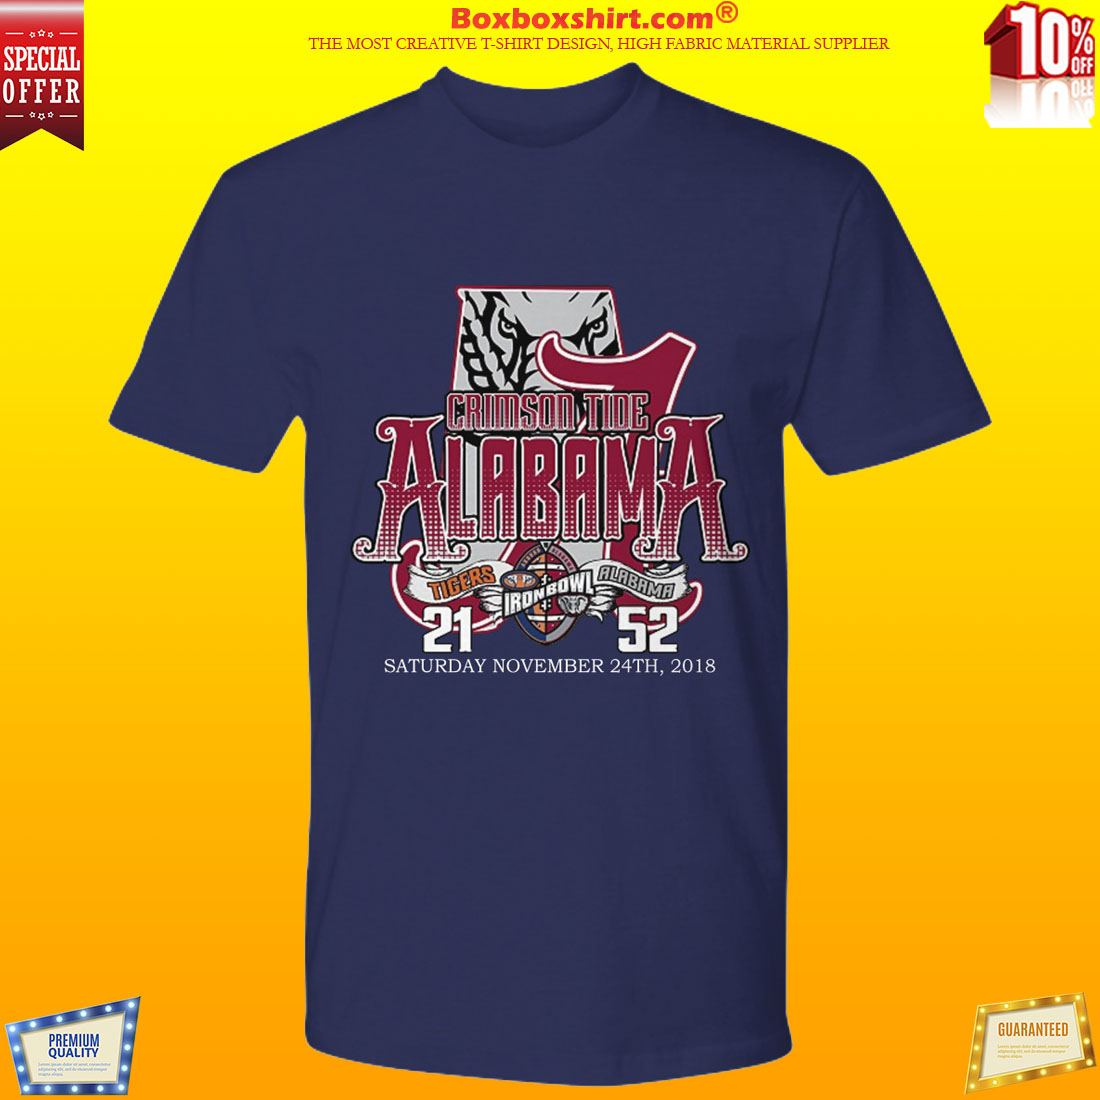 Alabama Crimson Tide and Auburn Tigers shirt